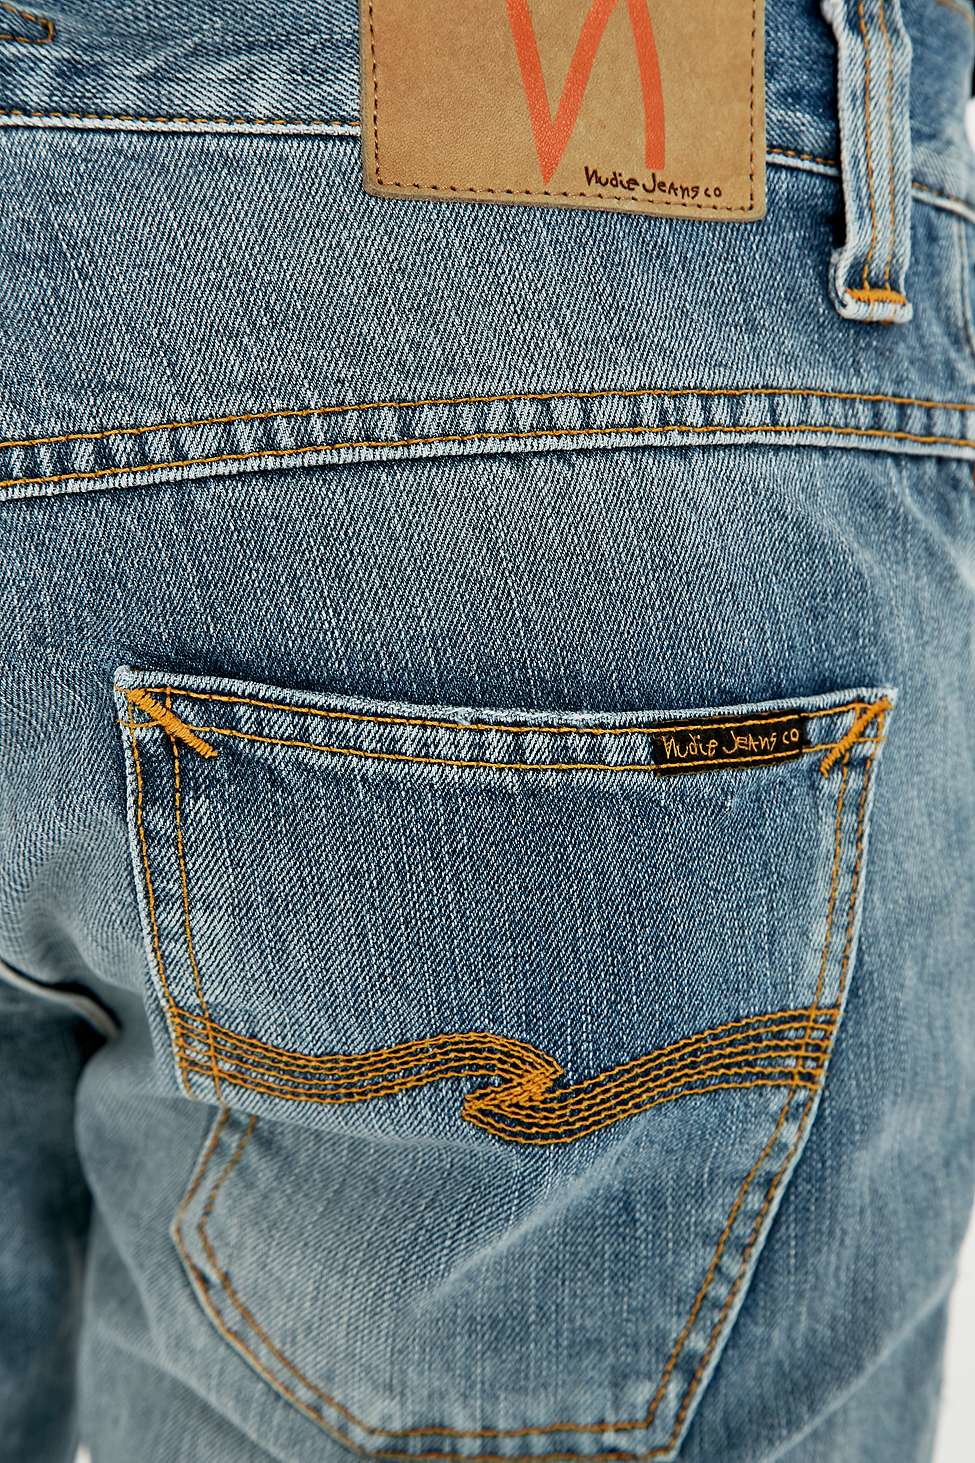 Nudie Jeans Denim Grim Tim 22 Months Ripped Slim Fit Jeans in Indigo (Blue) for Men